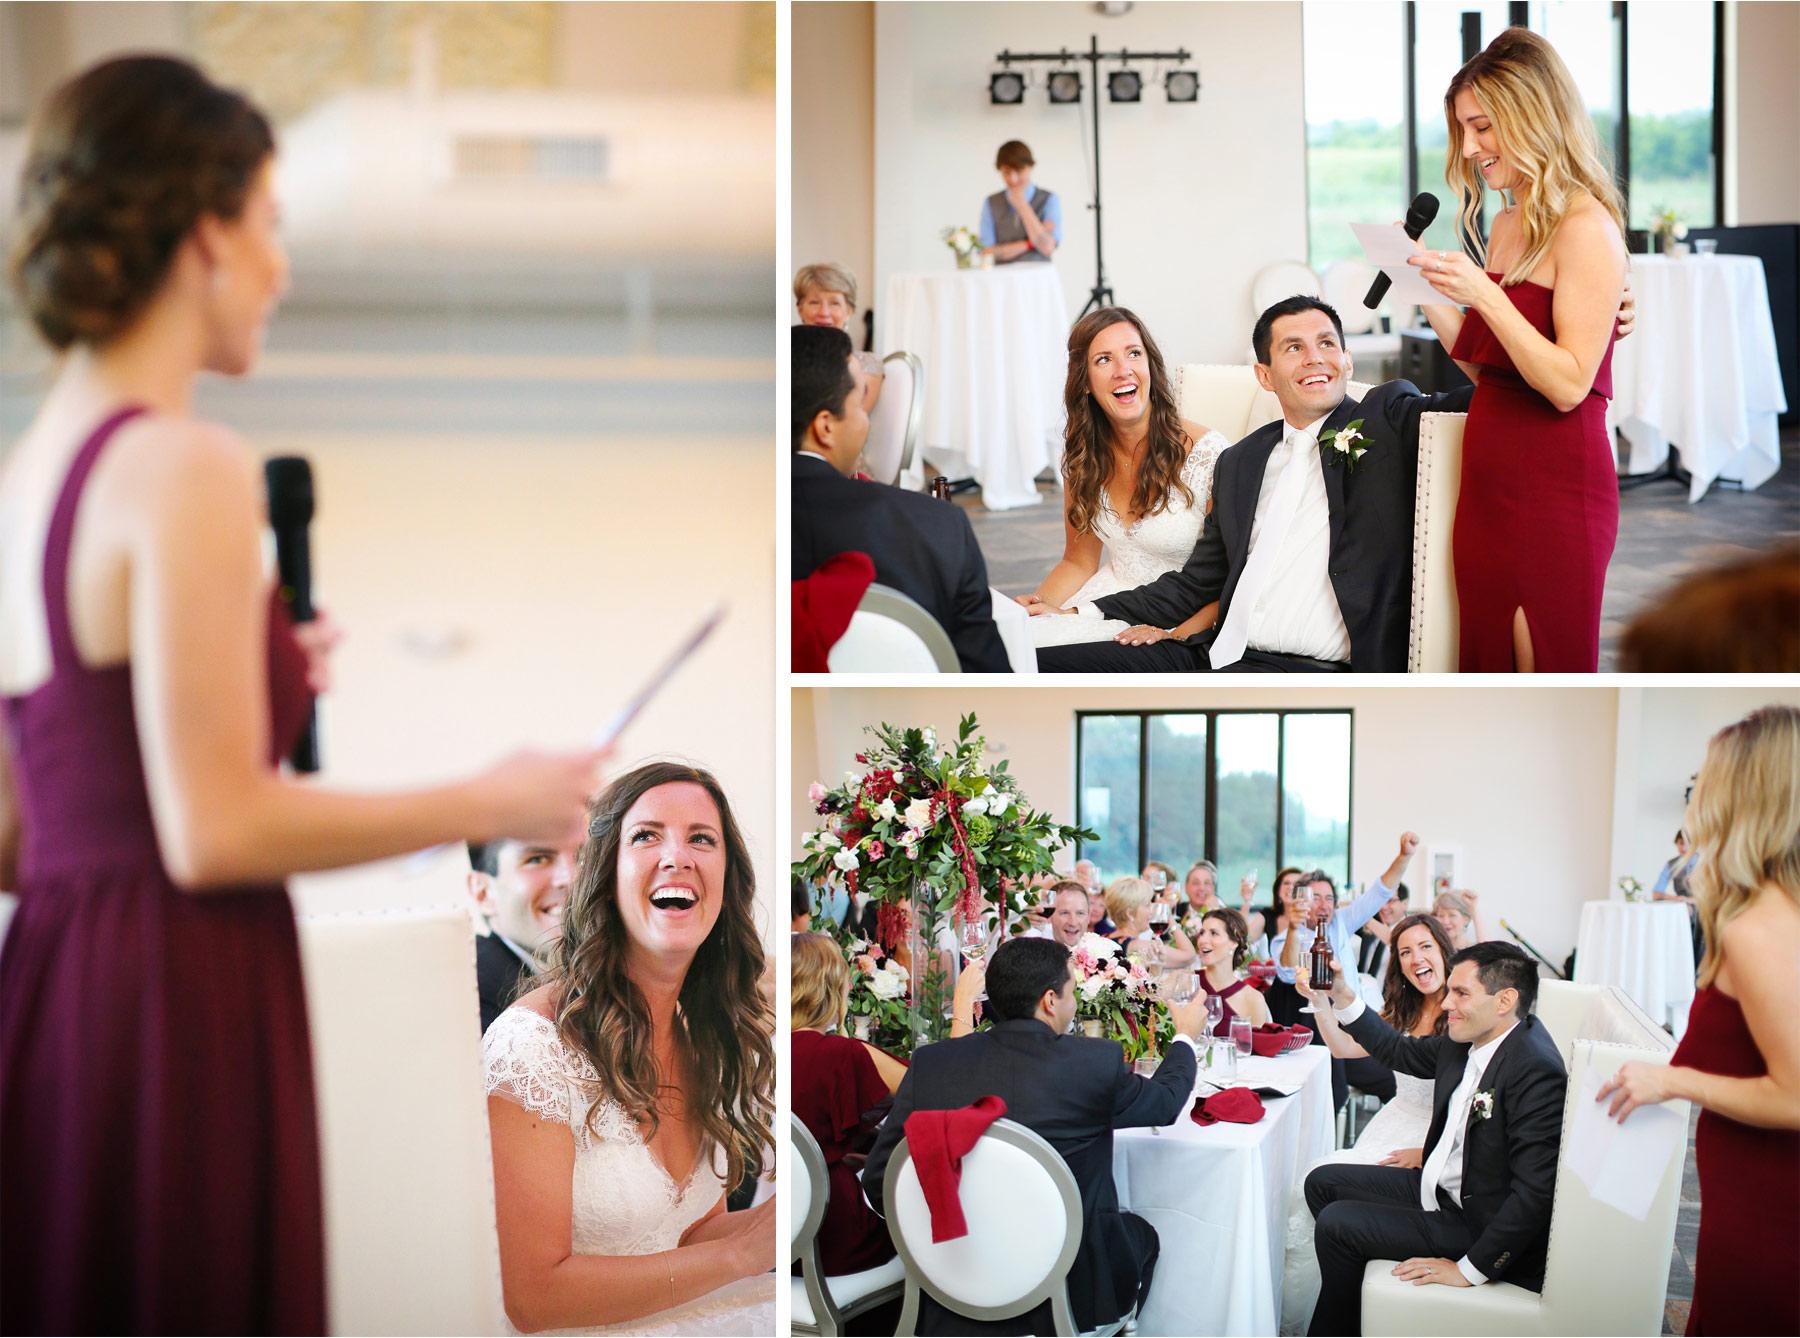 18-Weding-by-Vick-Photography-Minneapolis-Minnesota-Bavaria-Downs-Reception-Bride-Groom-Toast-Rebecca-and-Mark.jpg